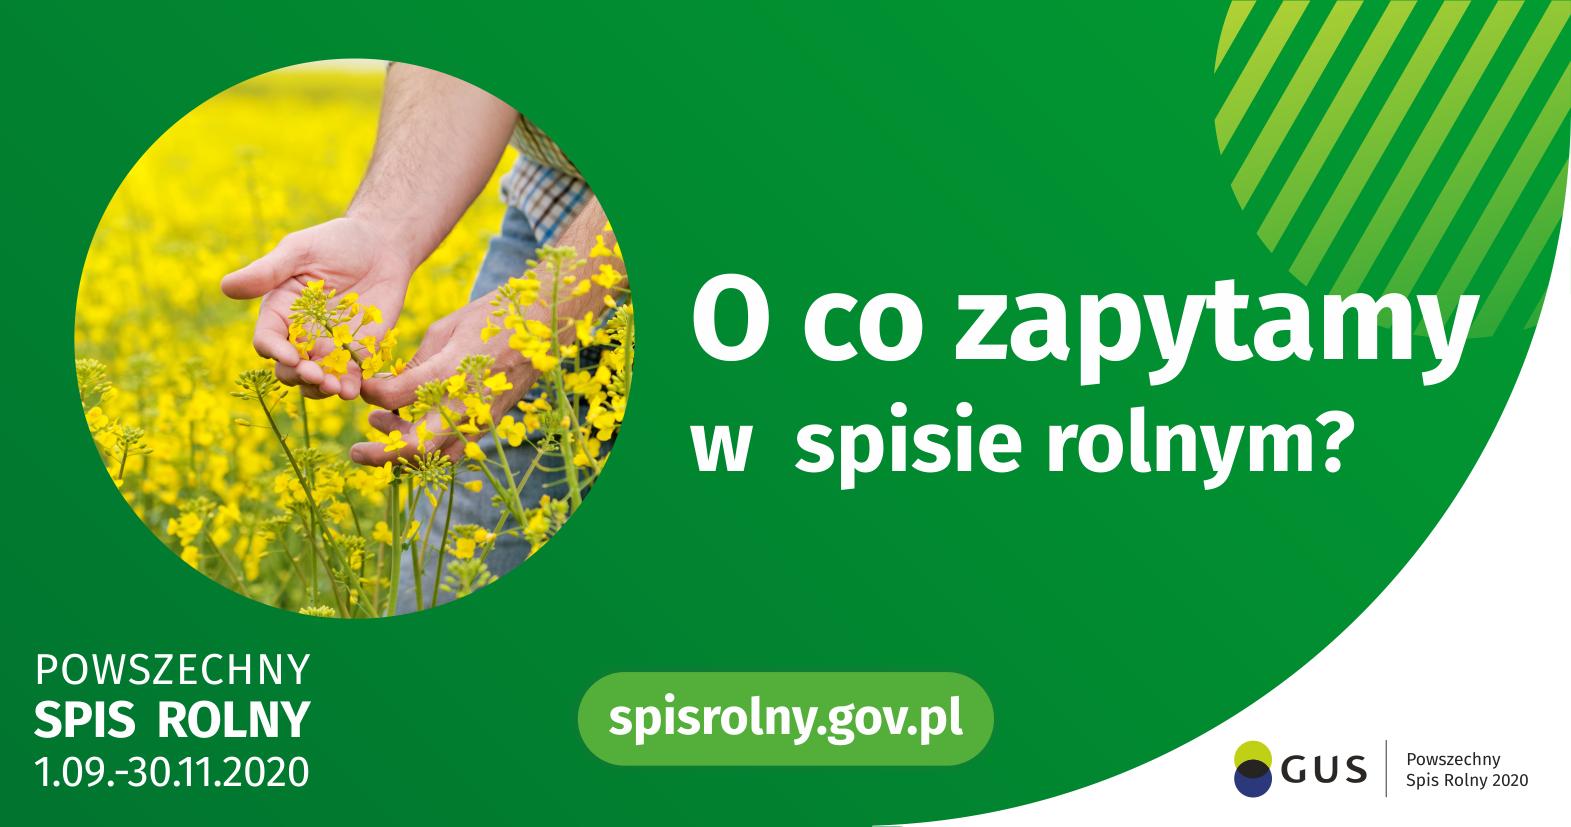 plakat- o co zapytamy w spisie rolnym